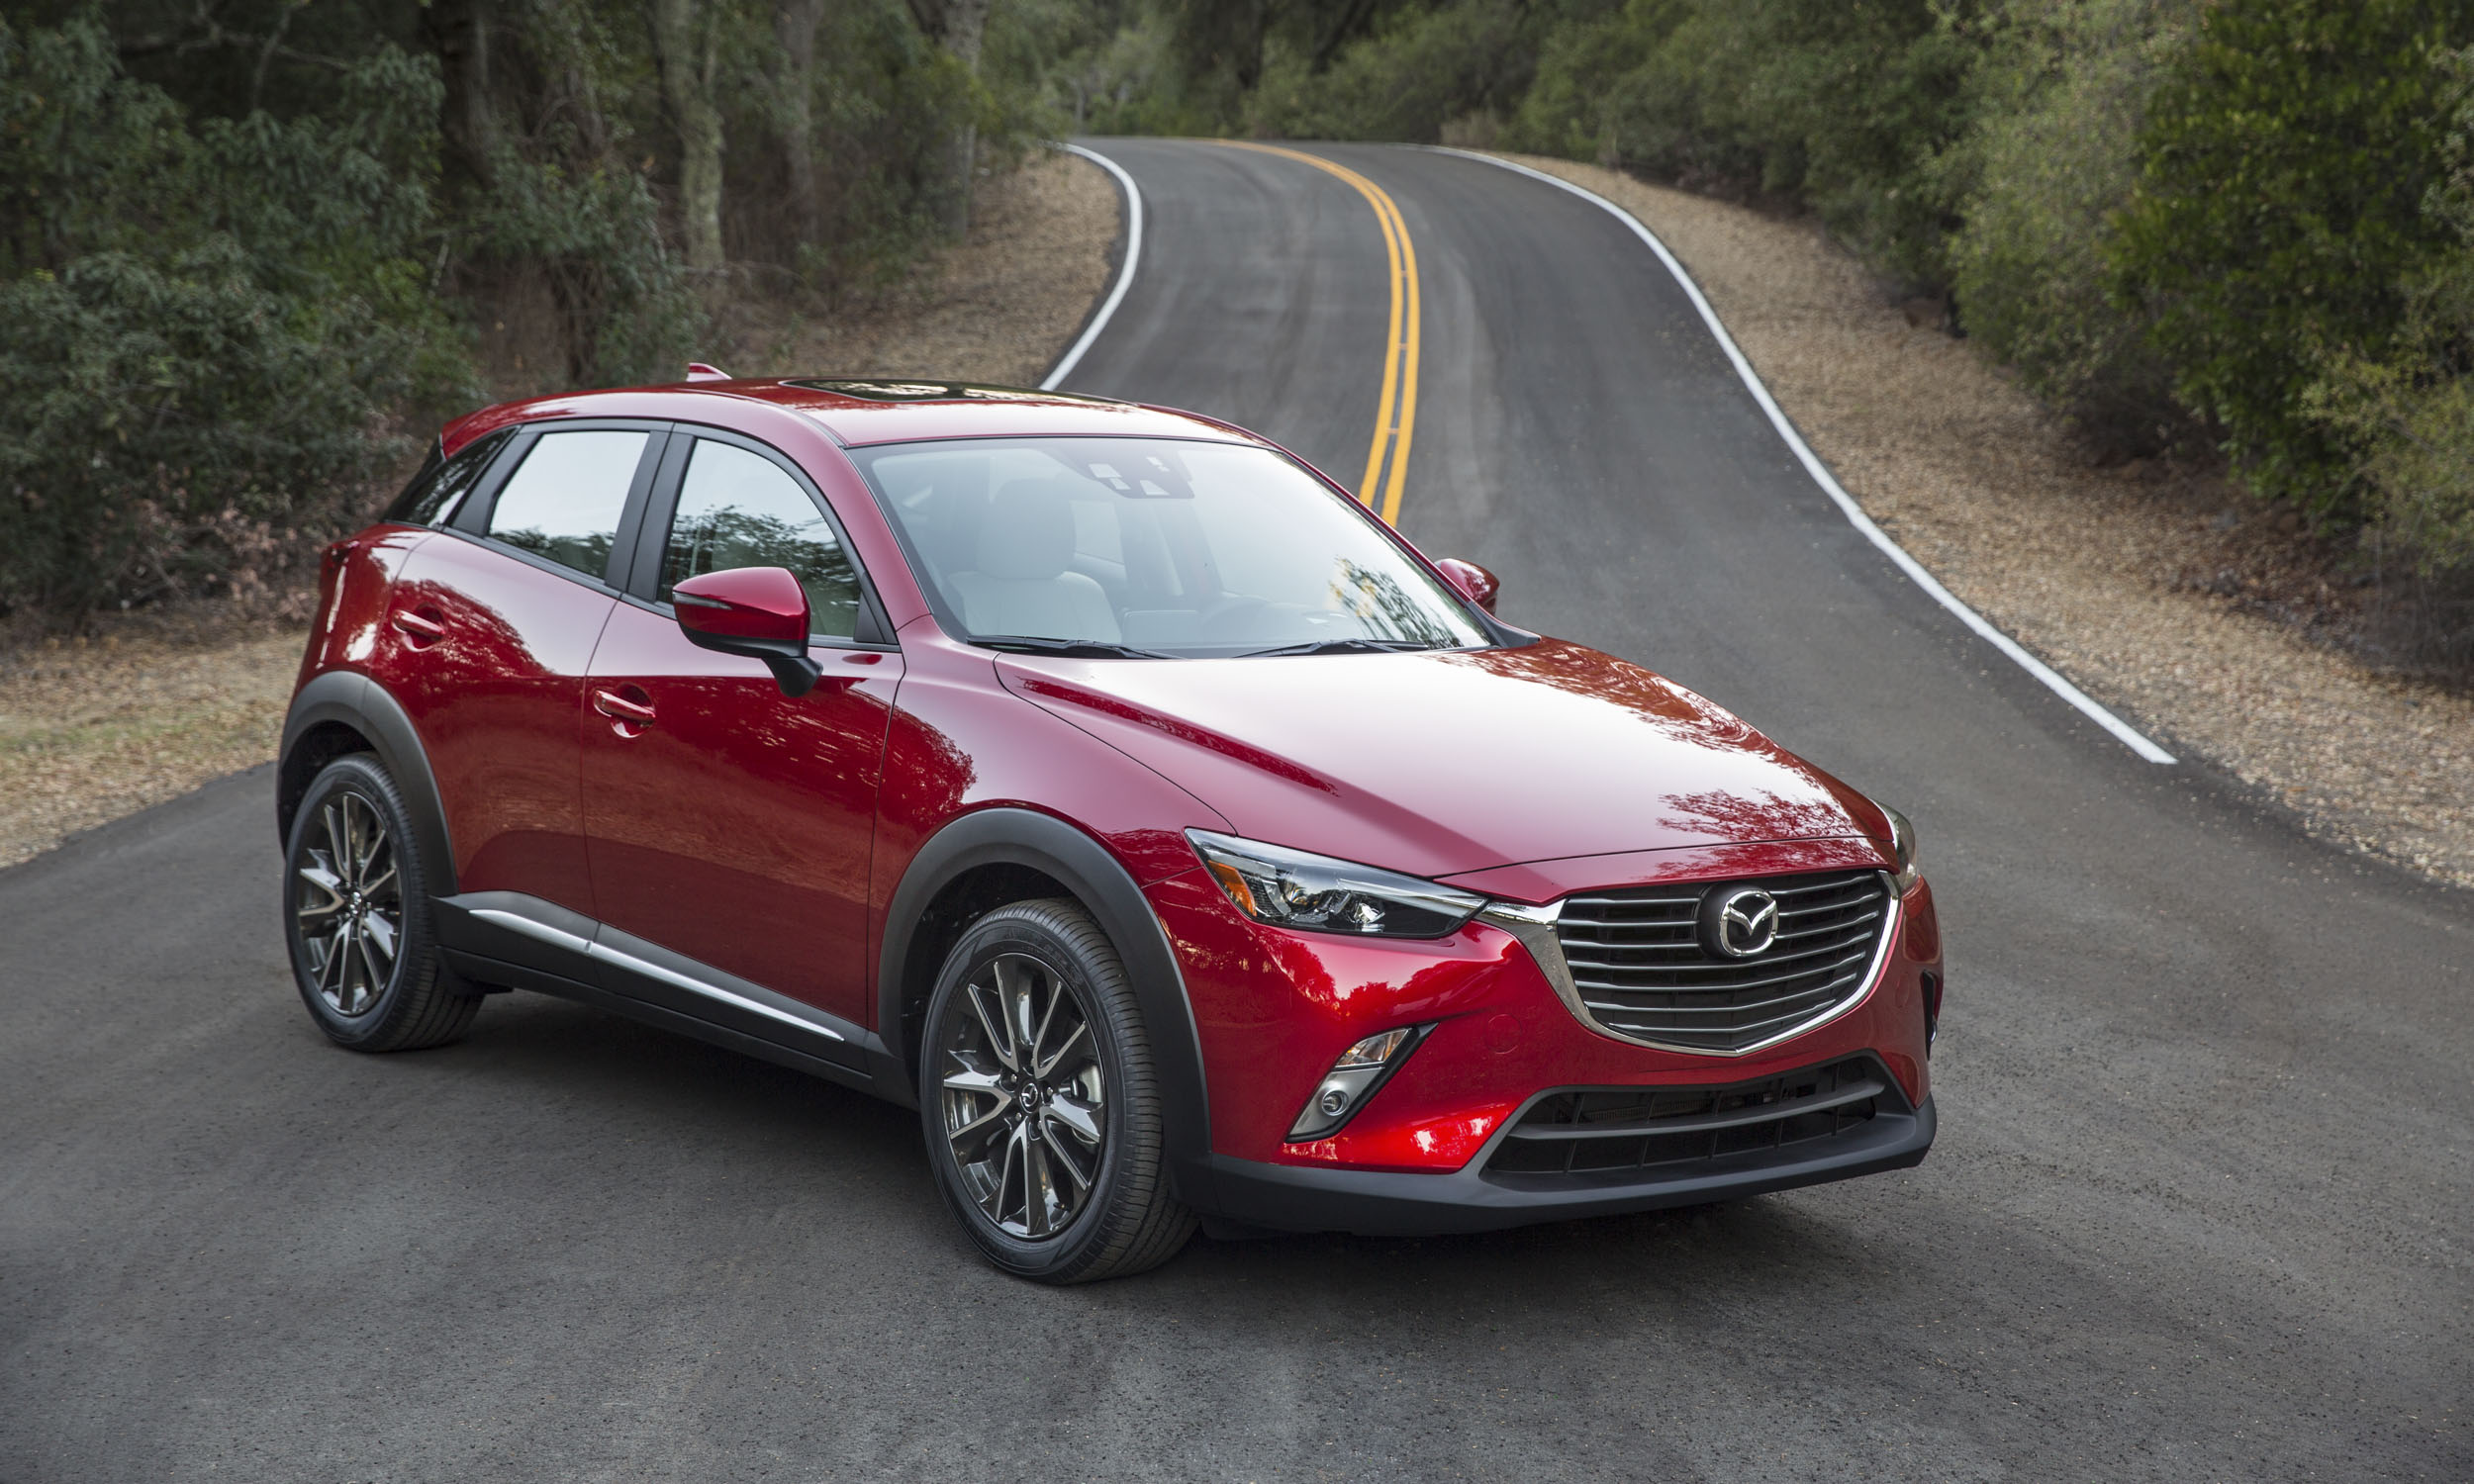 The Motoring World: USA RECALL MAZDA - Certain models are